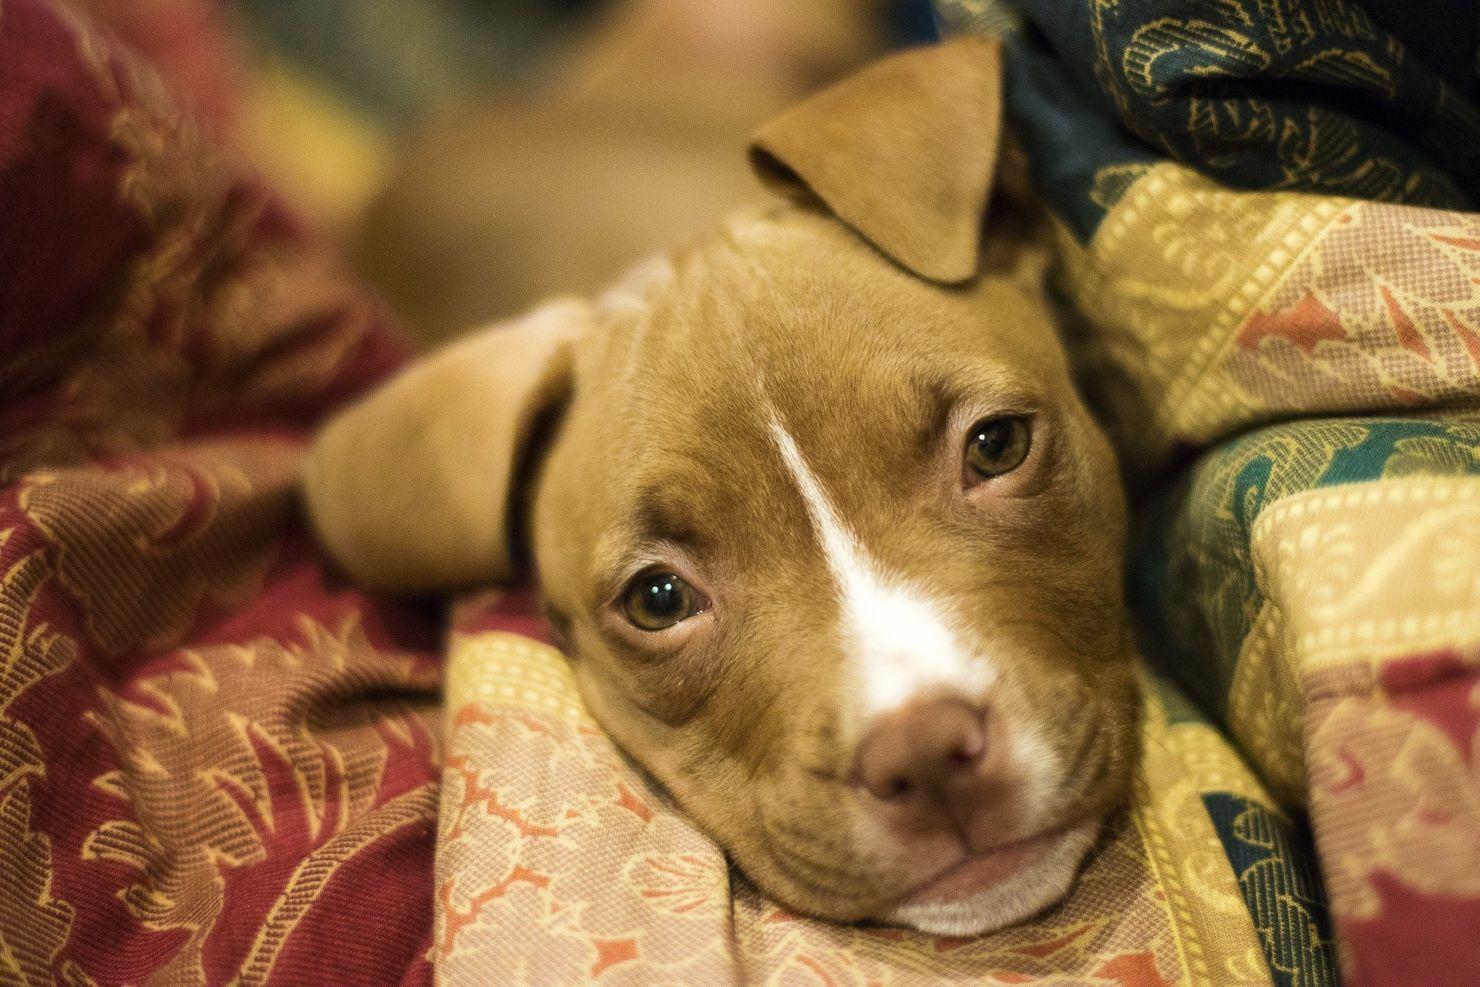 Consejos para cuidar a tu primera mascota sin problemas